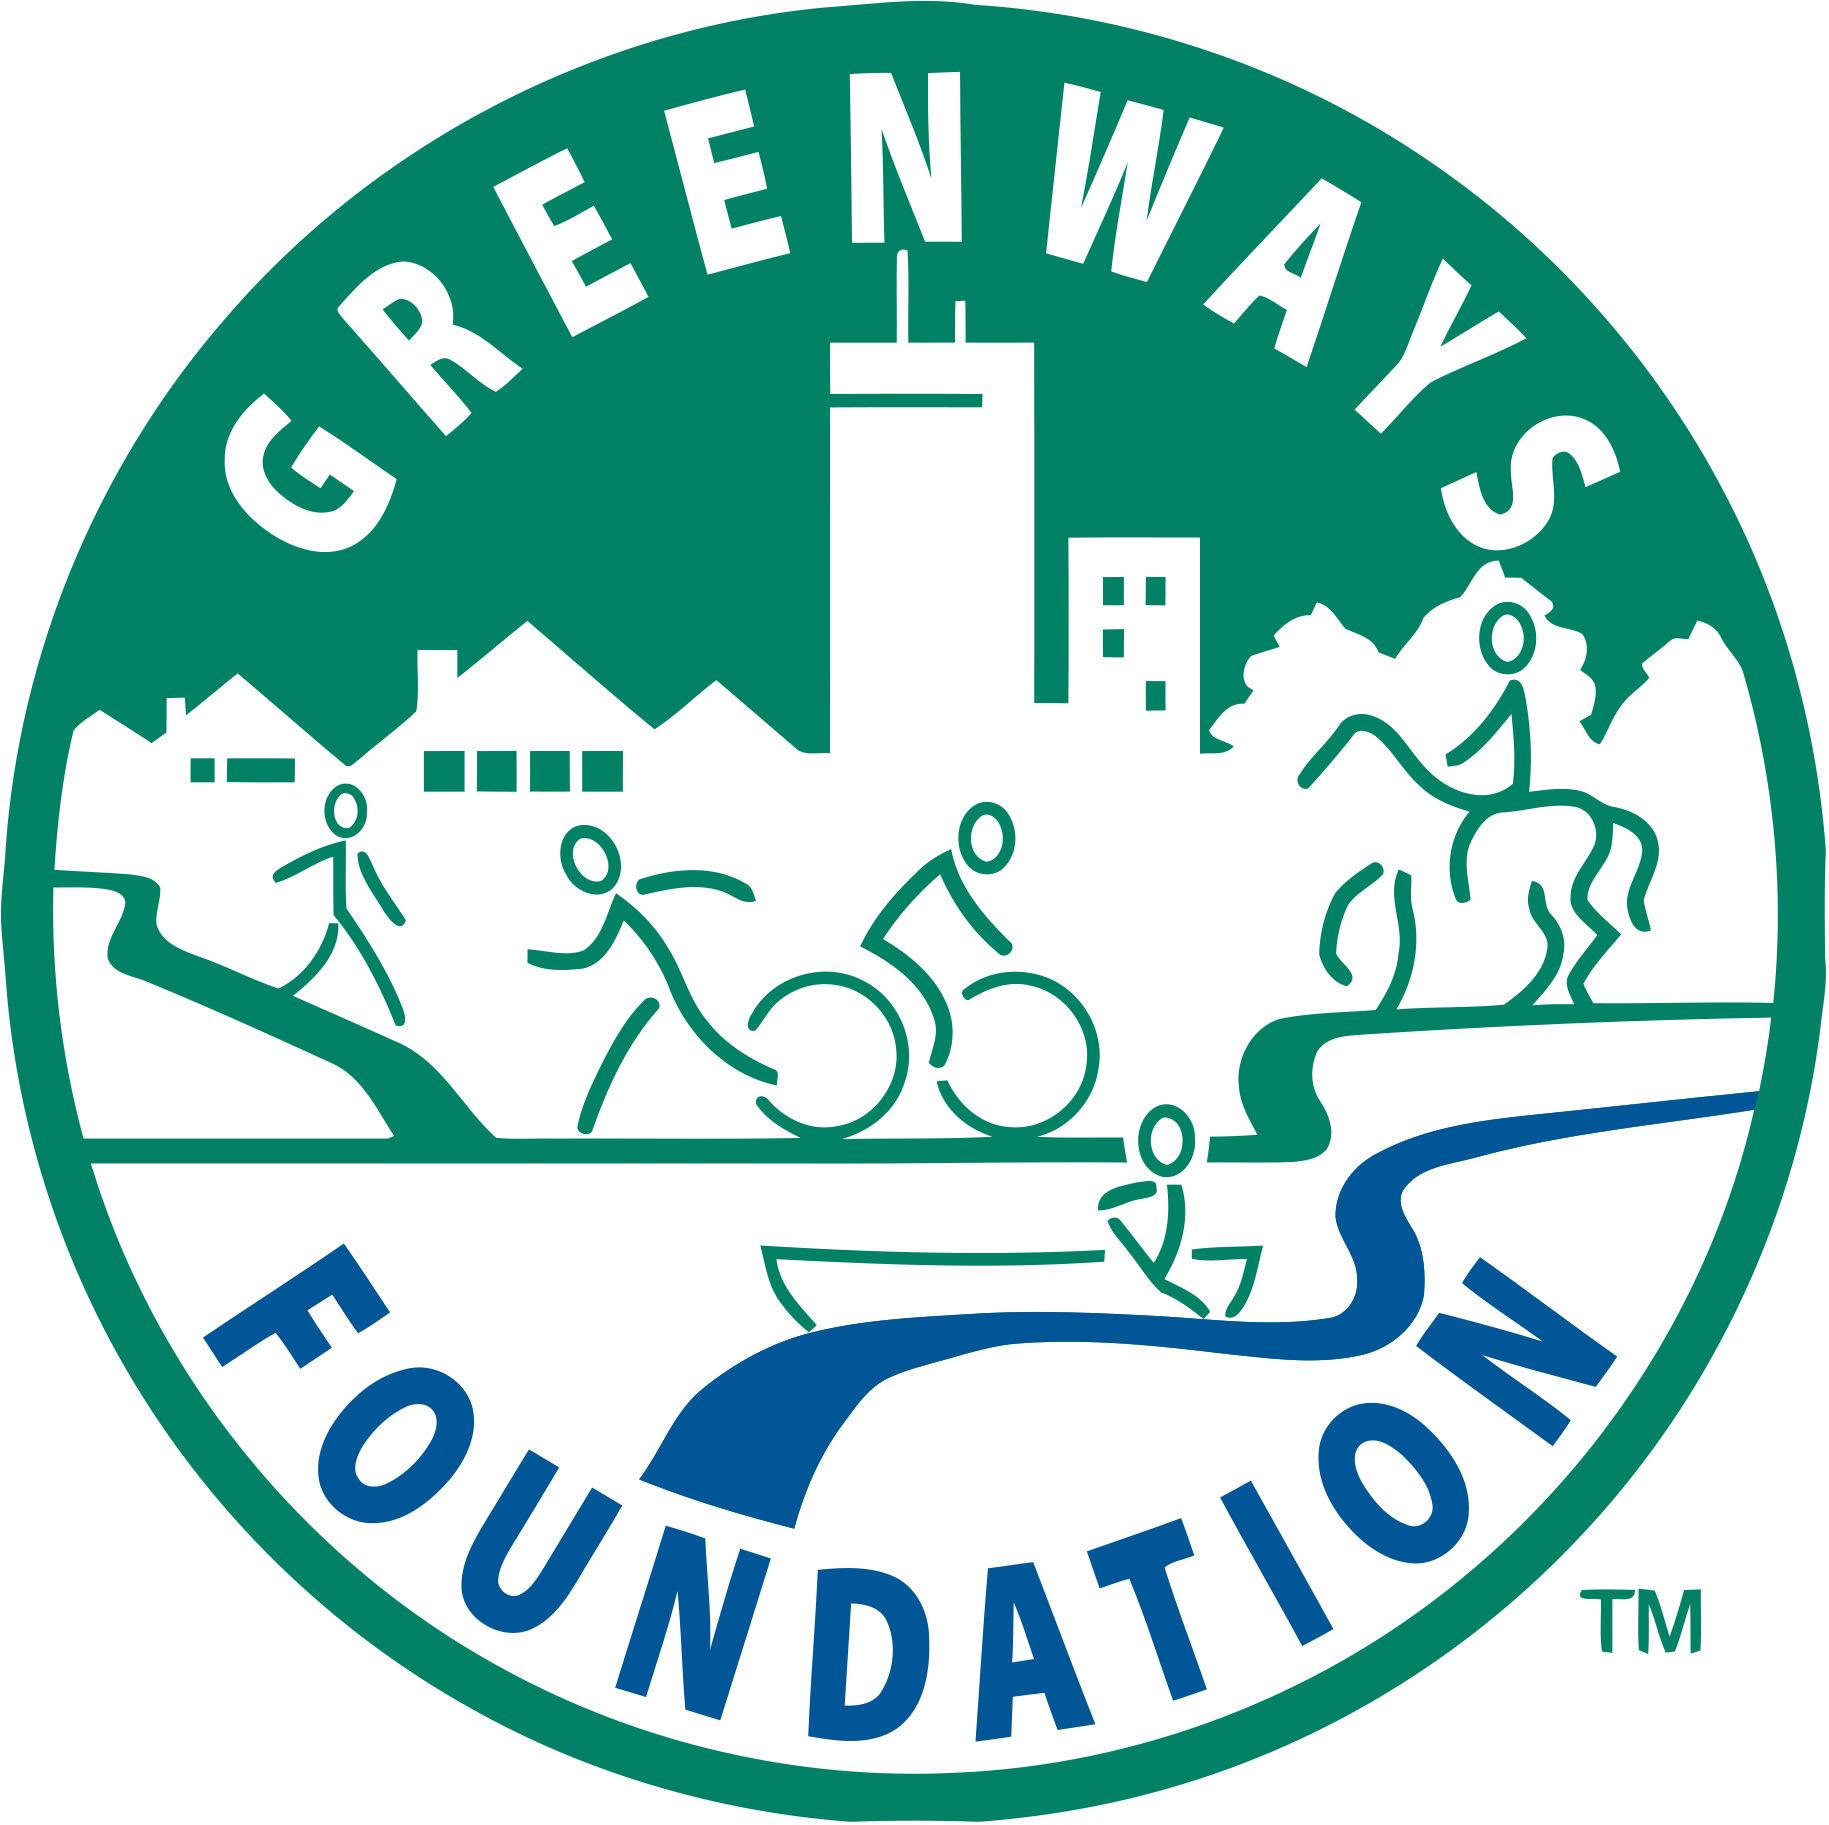 Greenways Foundation